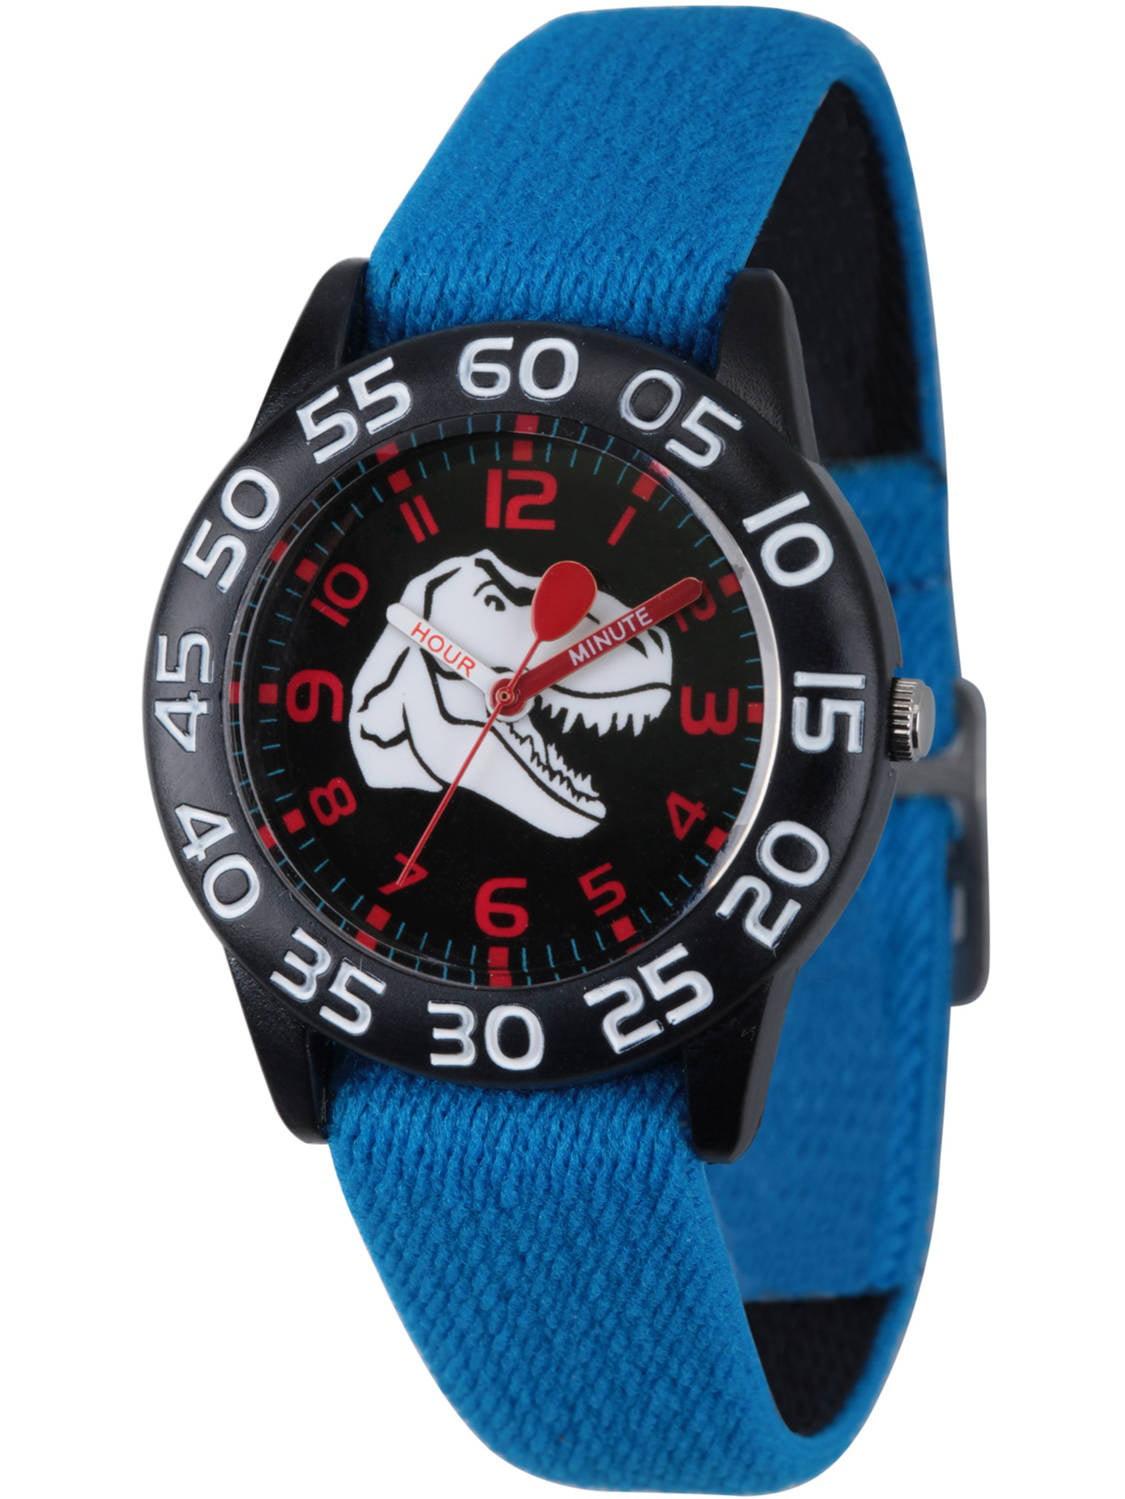 Dinosaur Boys' Black Plastic Time Teacher Watch, Reversible Blue and Black Elastic Nylon Strap